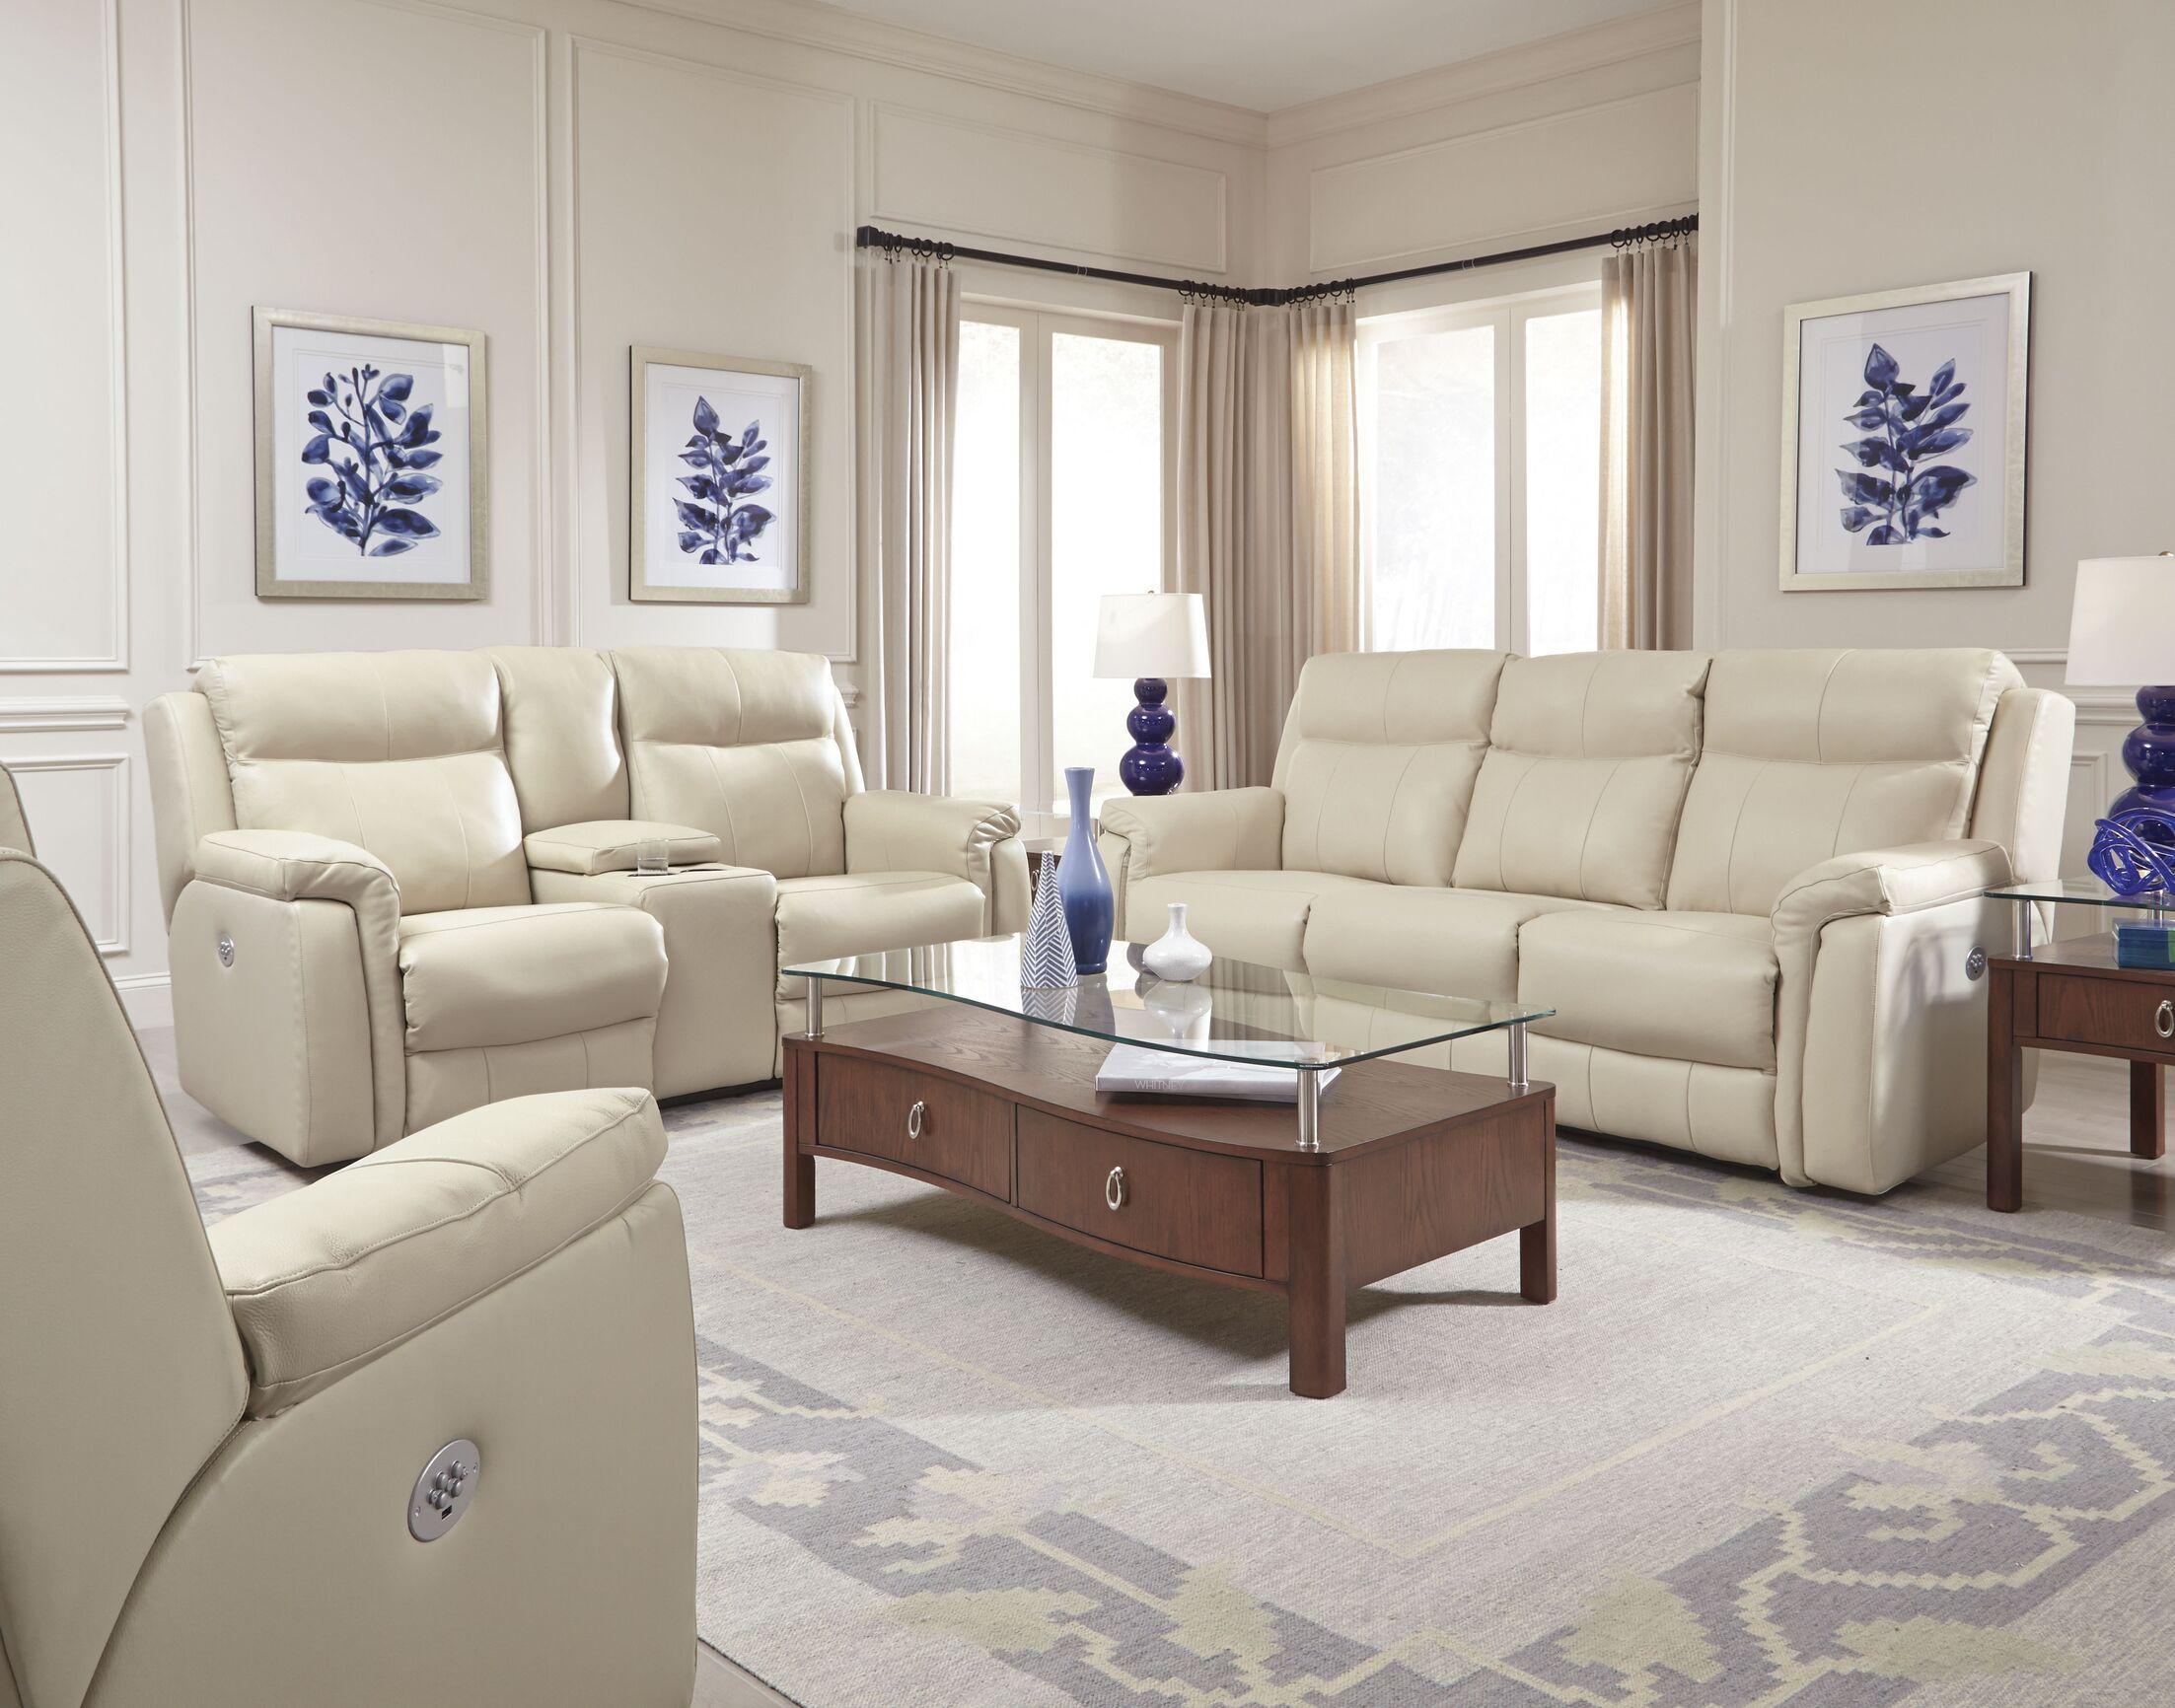 Uptown Reclining Sofa Reclining Type: Manual, Body Fabric: Ambition Cream